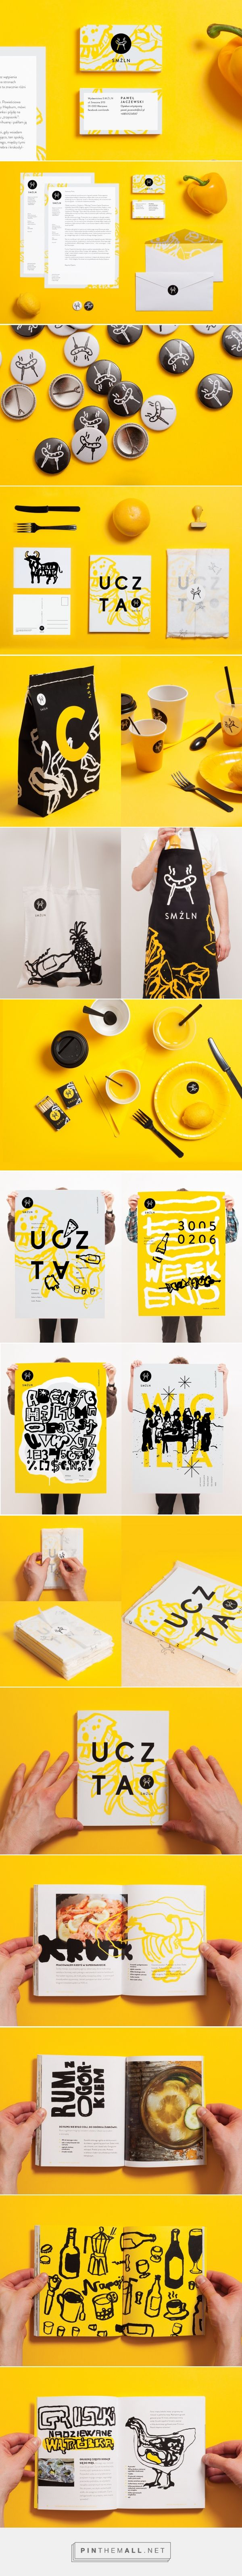 SMŻLN Culinary Publishing Company Branding by Pawel Jaczewski | Fivestar Branding Agency – Design and Branding Agency & Curated Inspiration Gallery